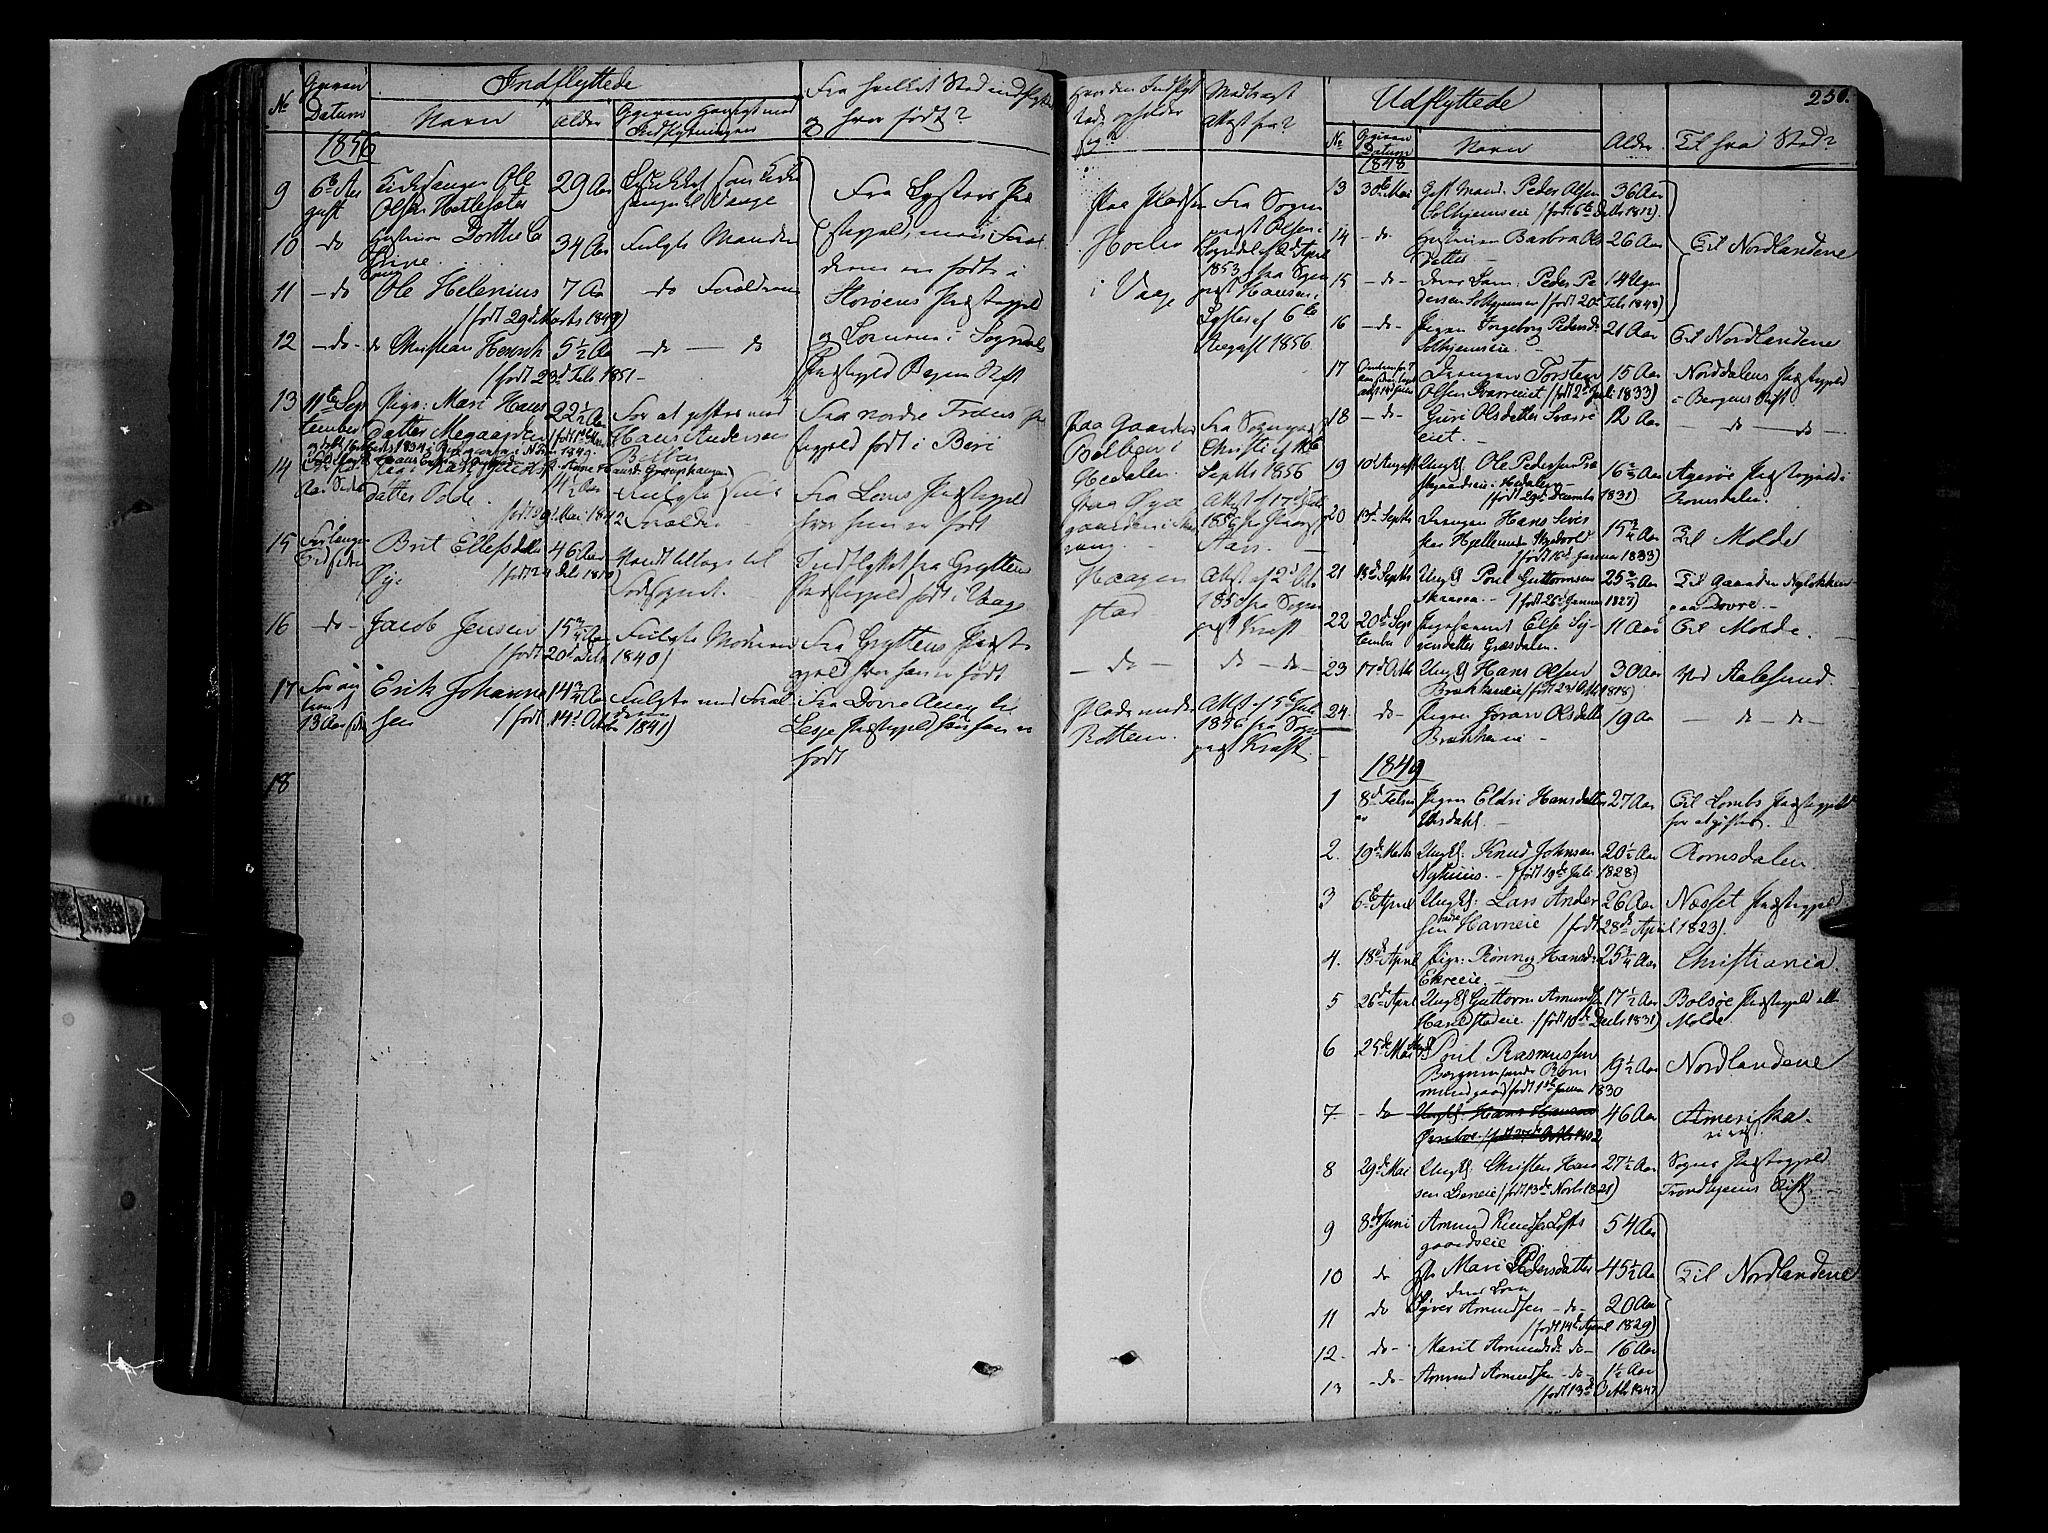 SAH, Vågå prestekontor, Ministerialbok nr. 5 /1, 1842-1856, s. 250